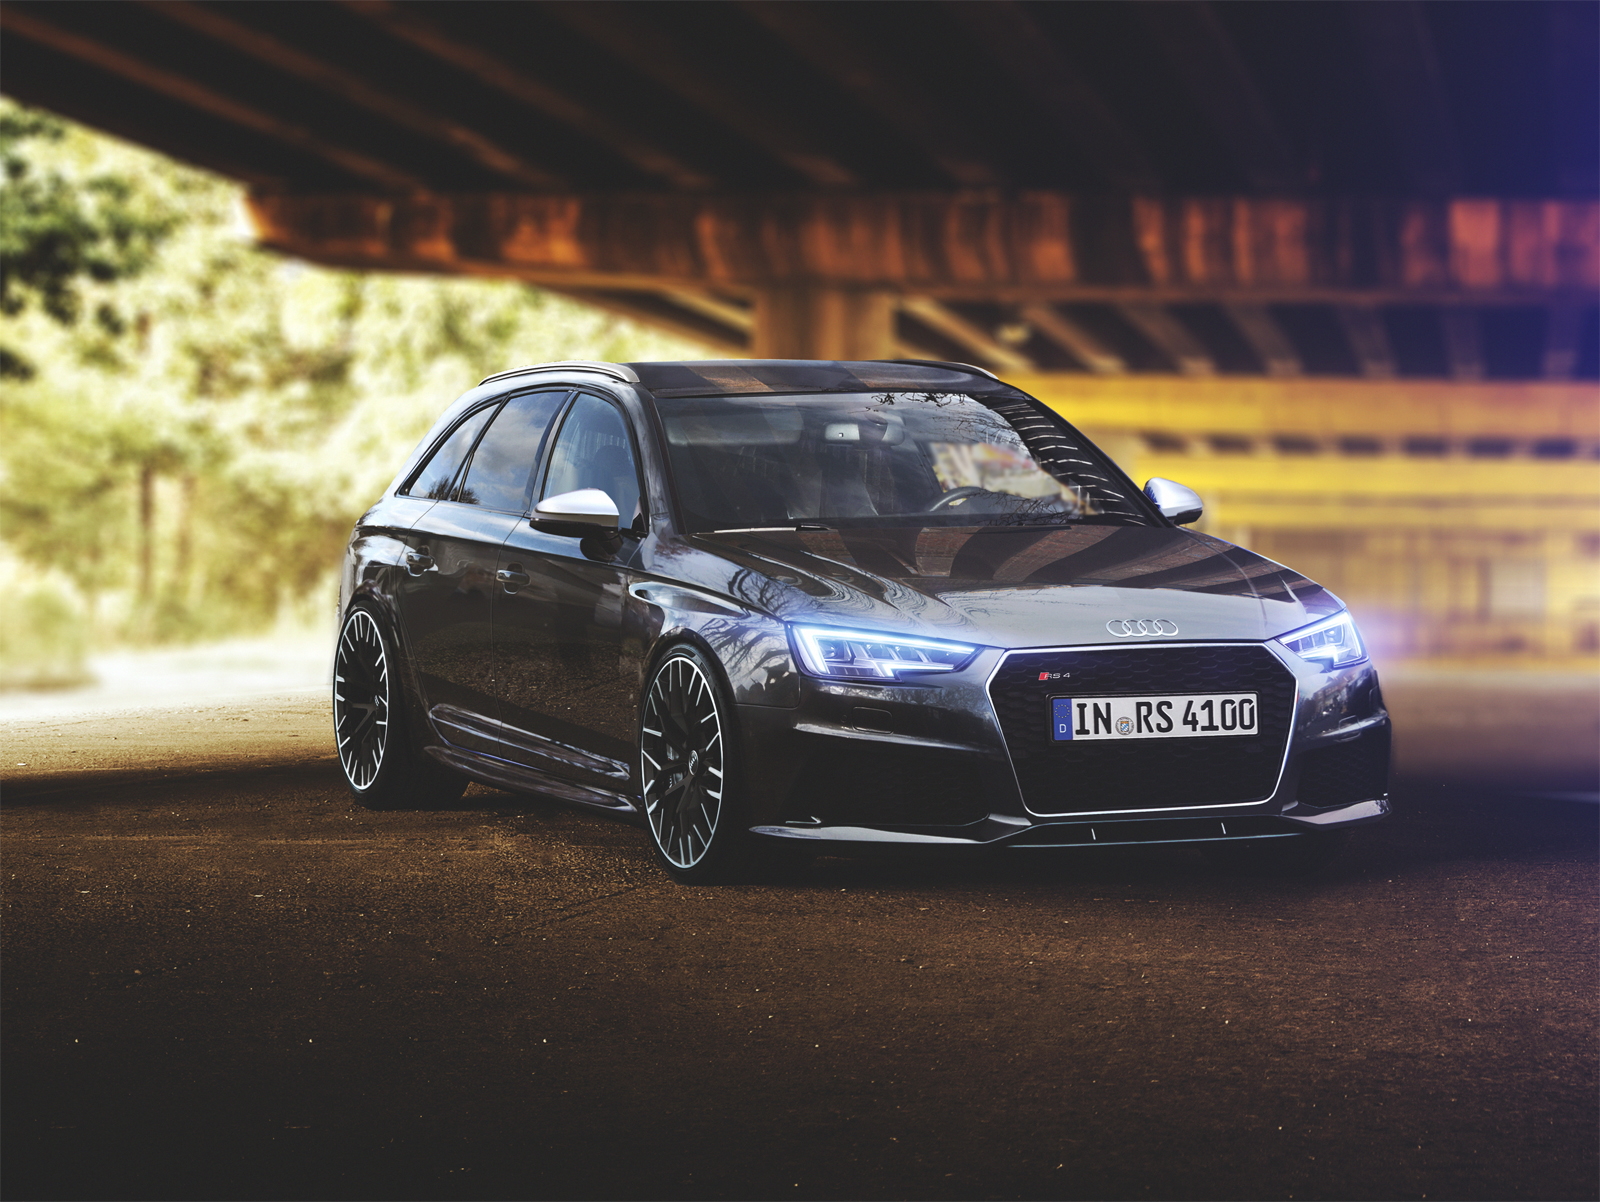 Audi RS4 2016 by Marko0811 on DeviantArt  Audi Rs Black on 2014 audi tt black, 2016 chevrolet colorado black, 2016 audi tt colors, audi a6 black, 2016 ford rs black, 2016 audi q7, 2016 camaro rs black, 2016 lexus ls black,